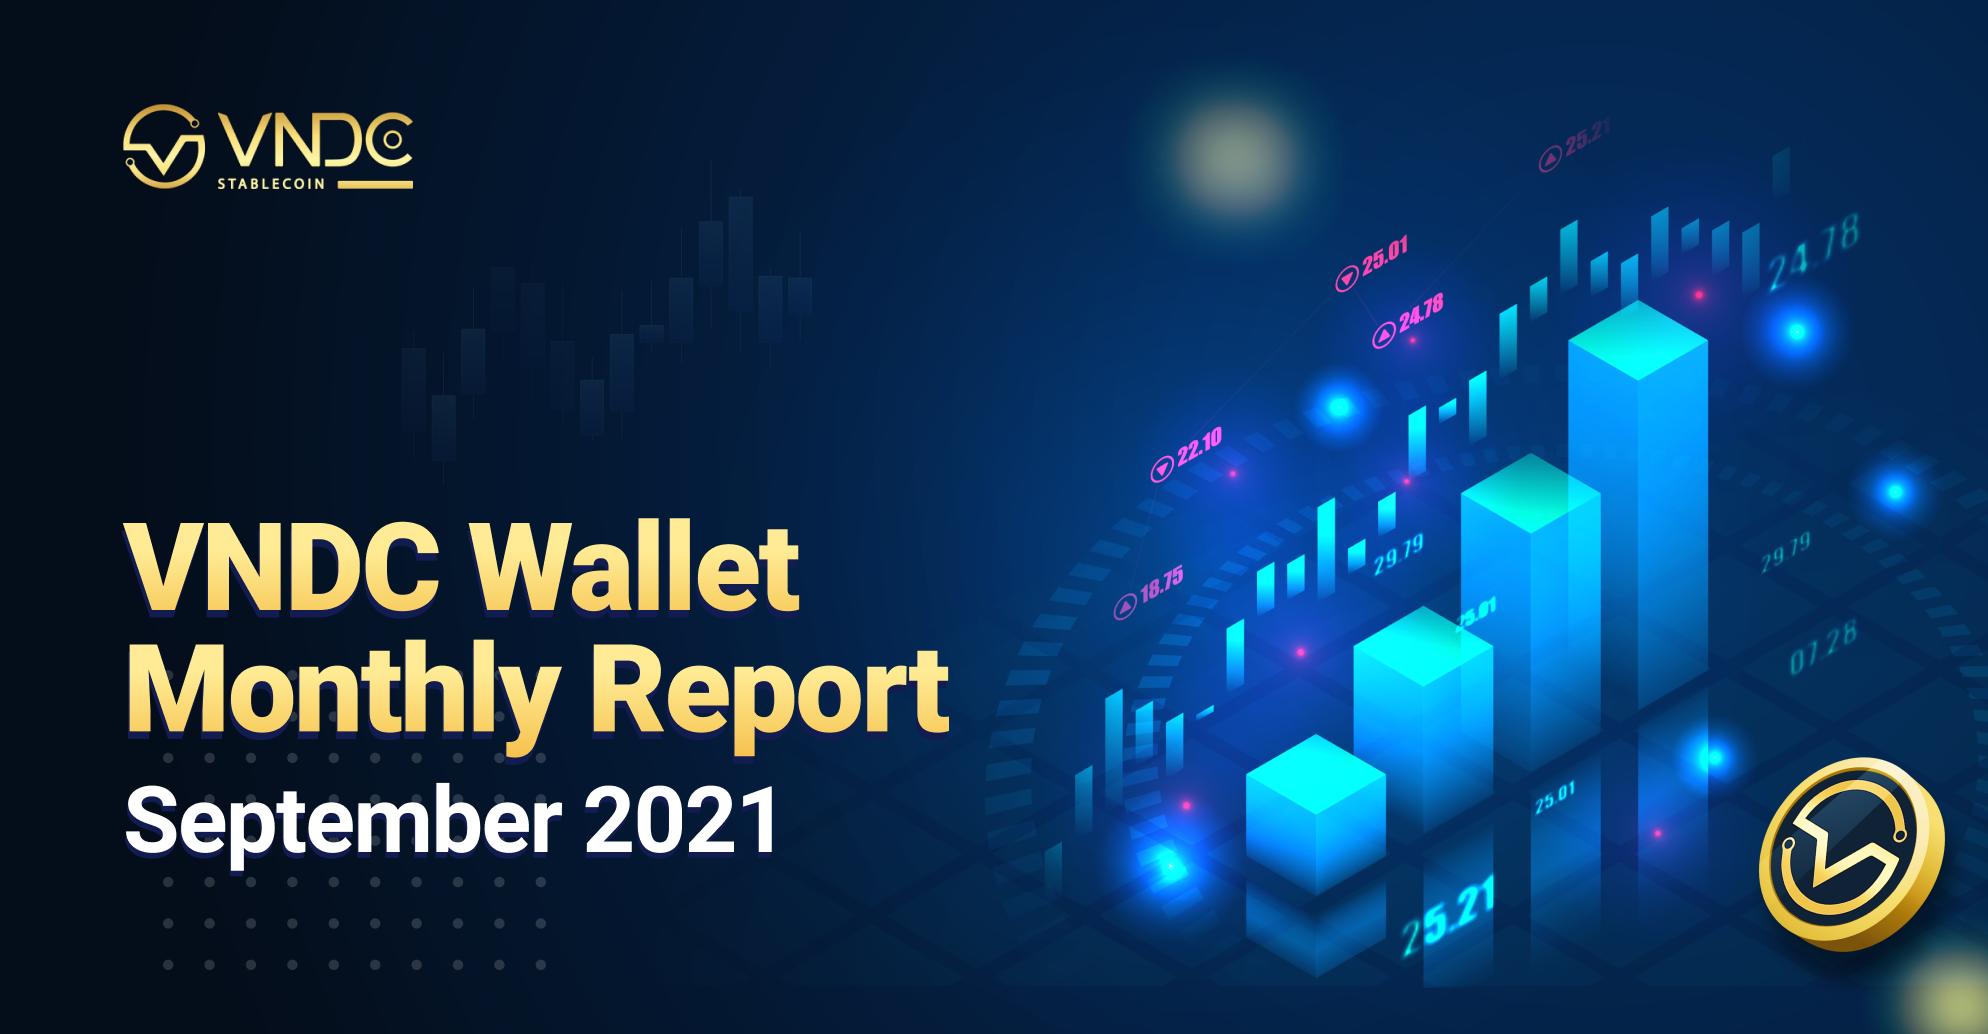 VNDC Wallet Monthly Report September 2021